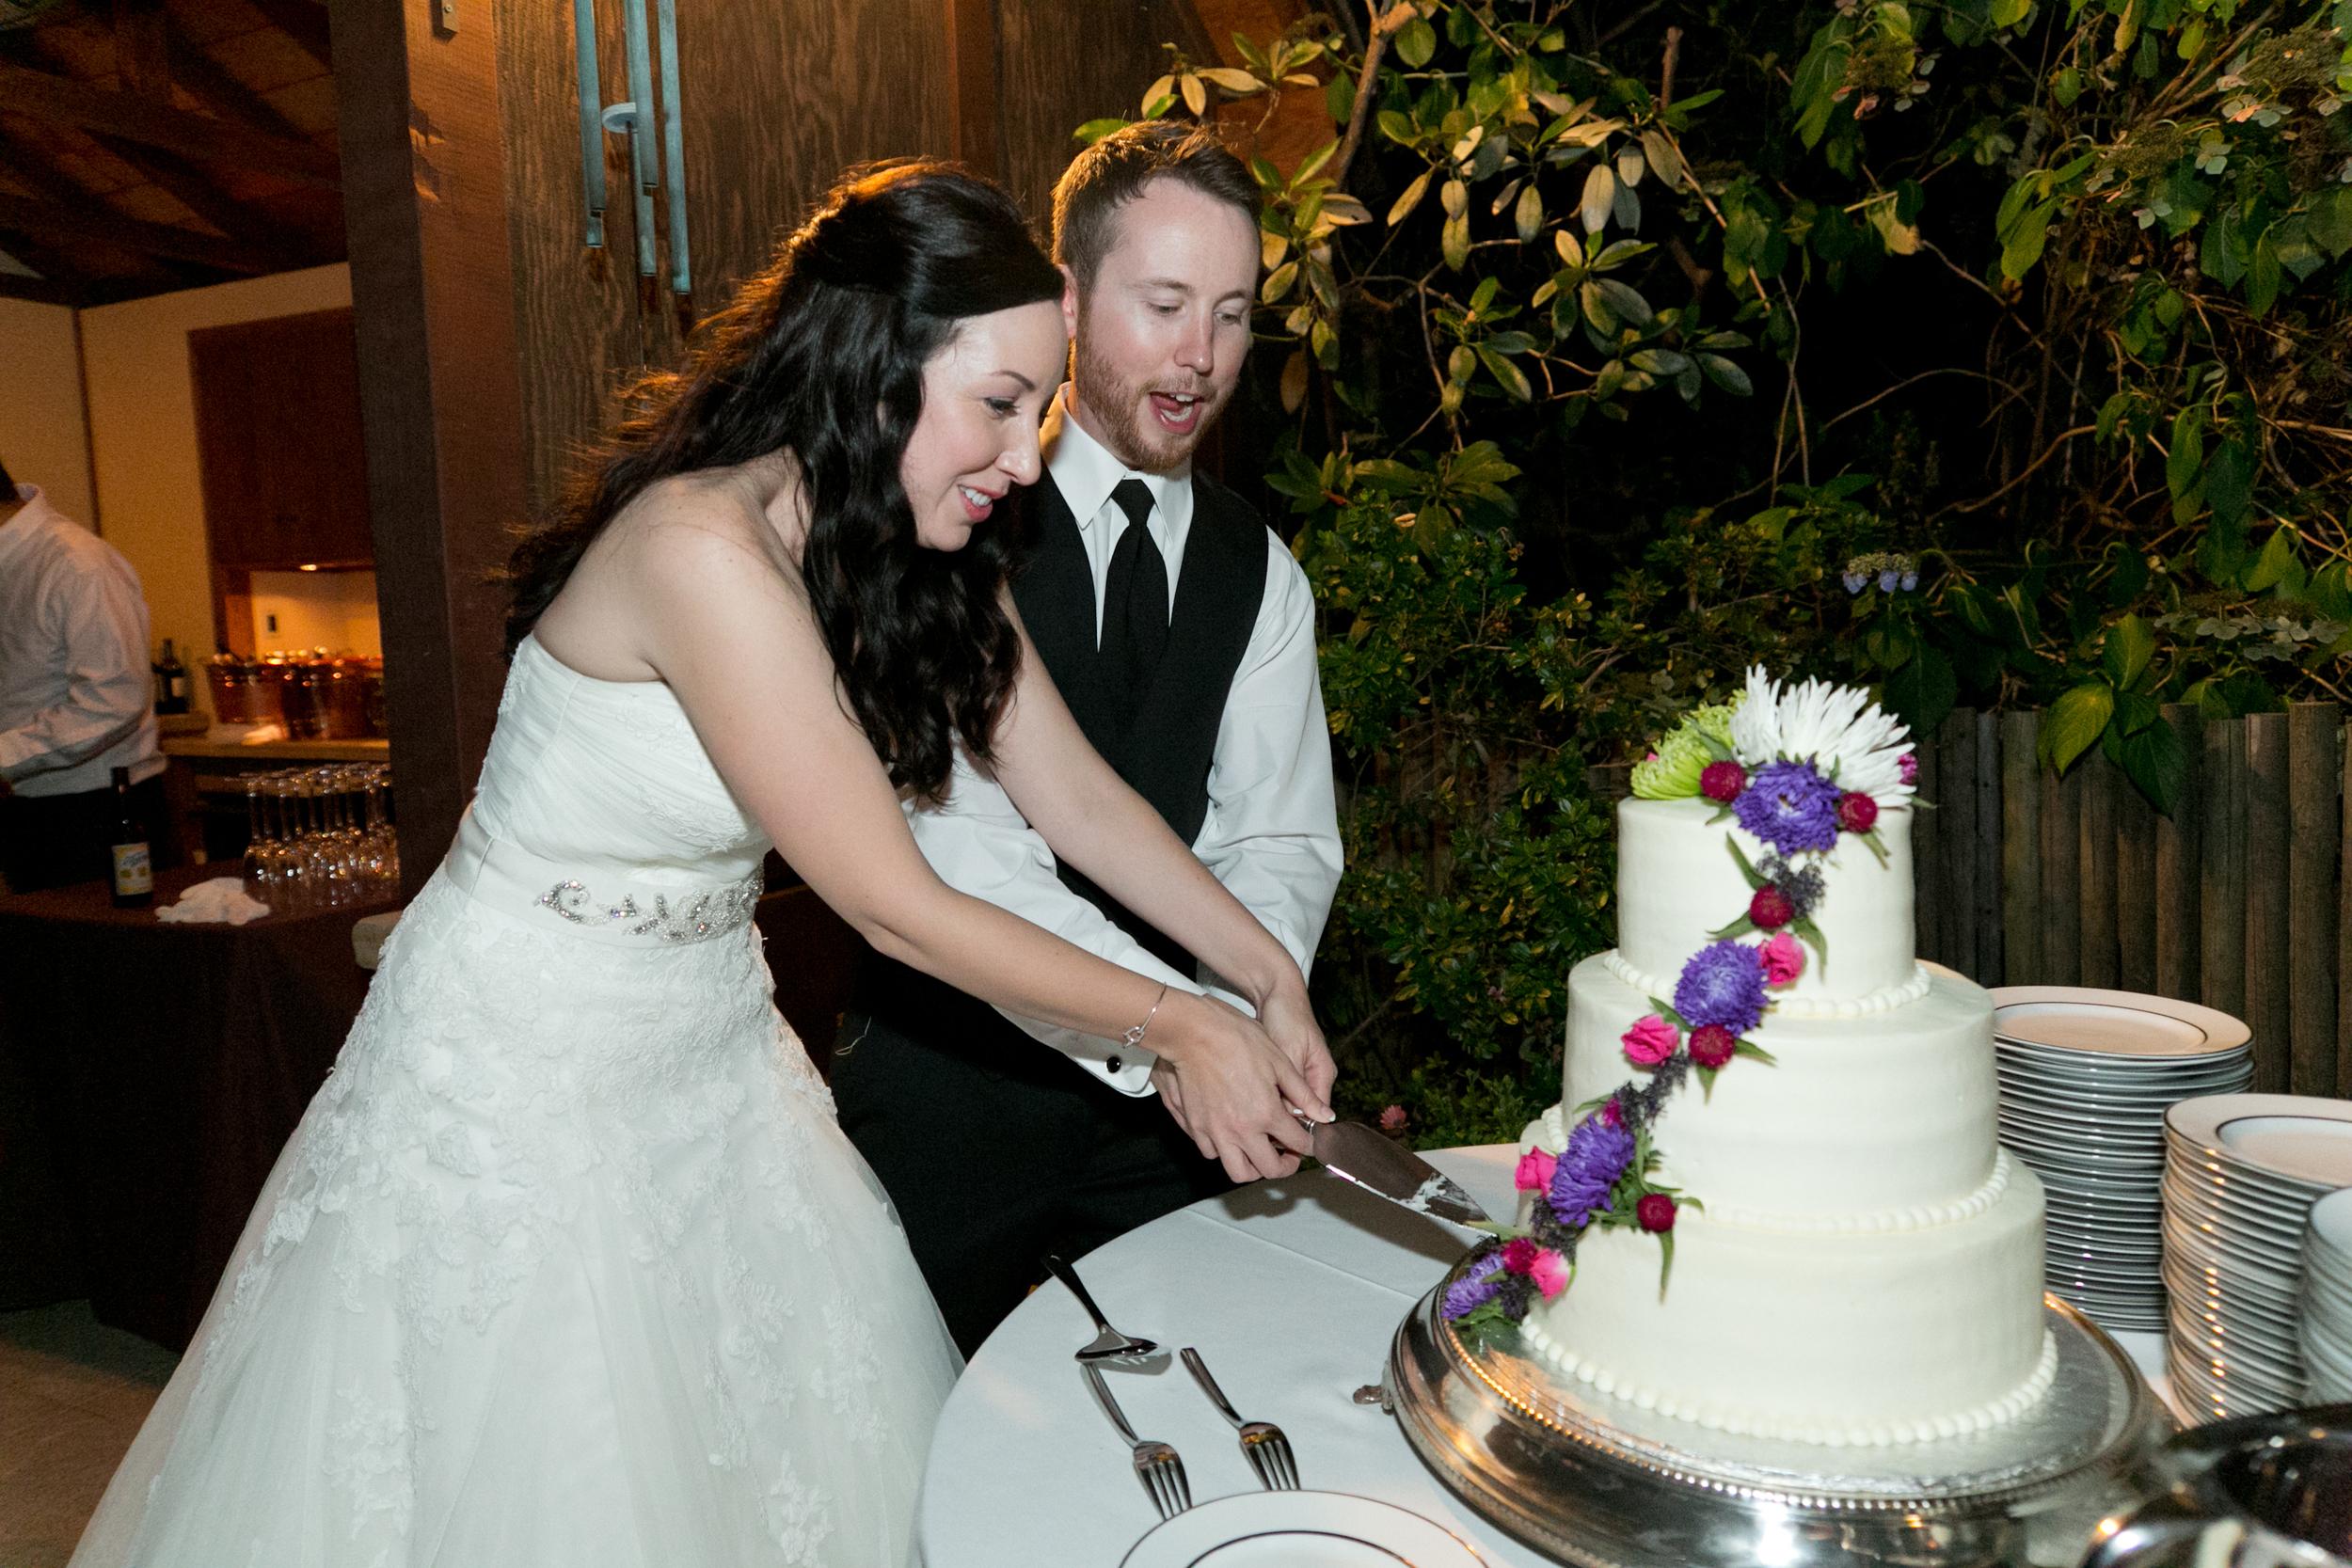 bride and groom cutting cake at sebastopol wedding